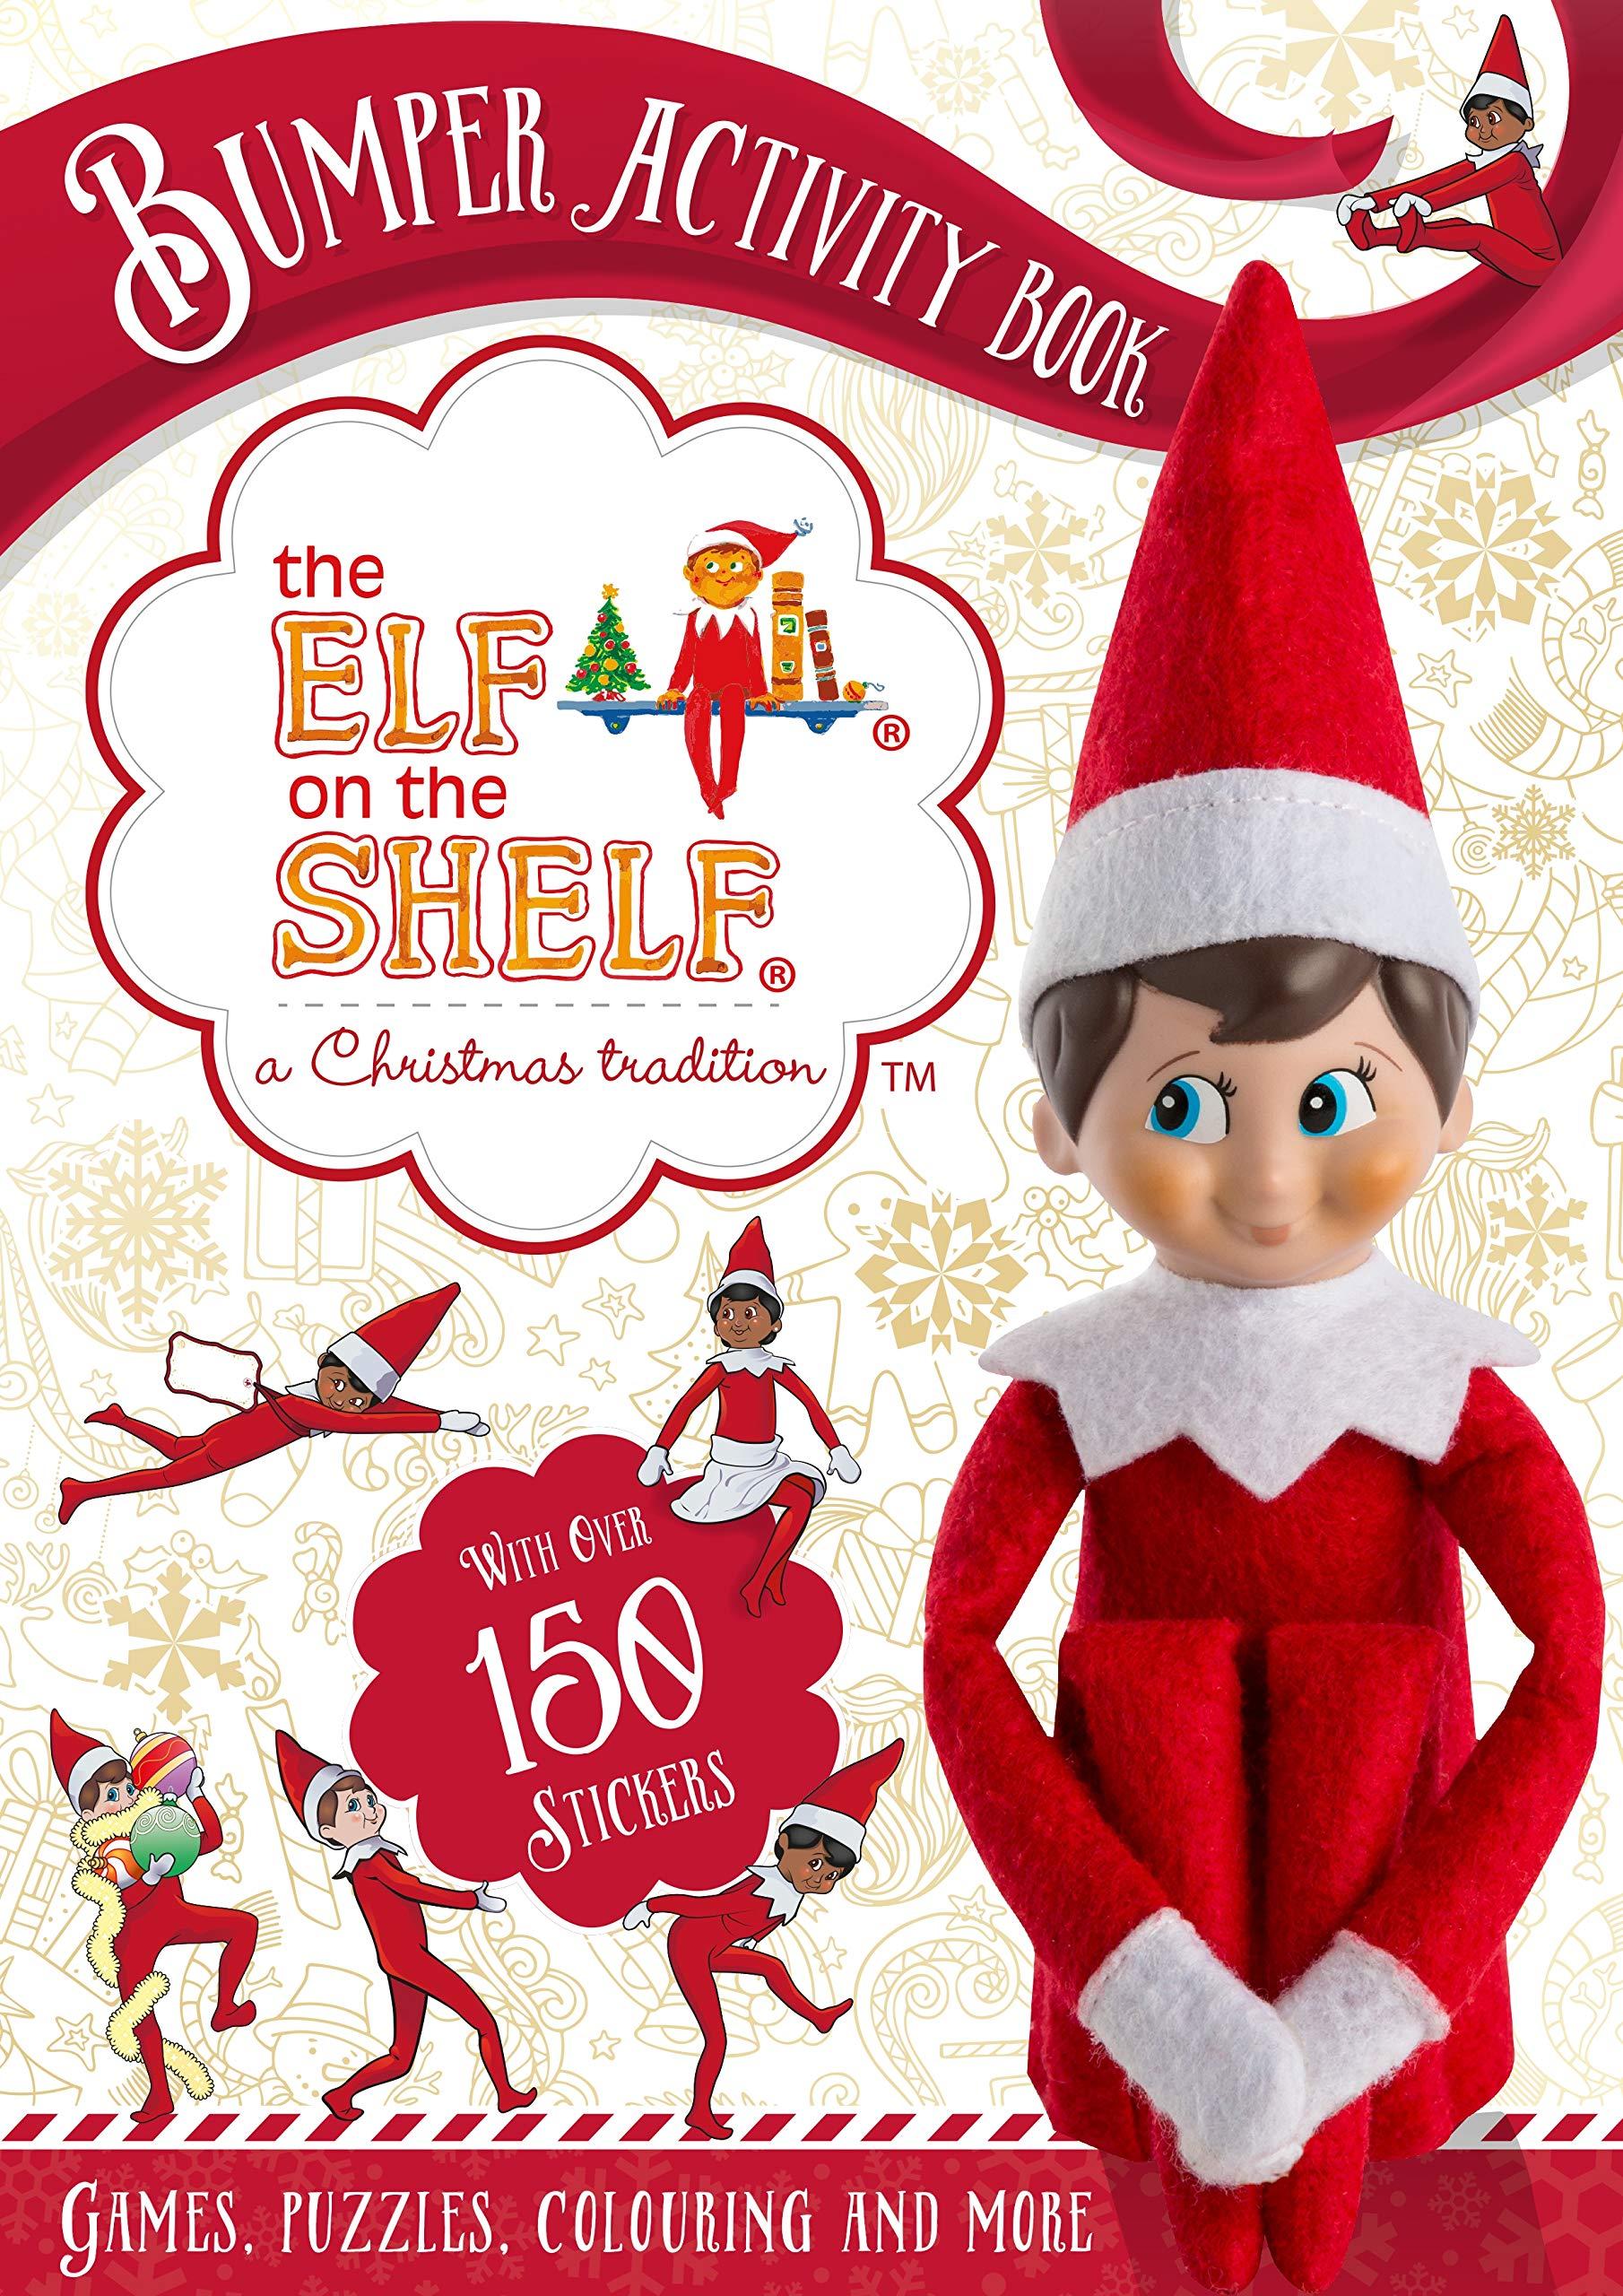 - The Elf On The Shelf Bumper Activity Book: The Elf On The Shelf